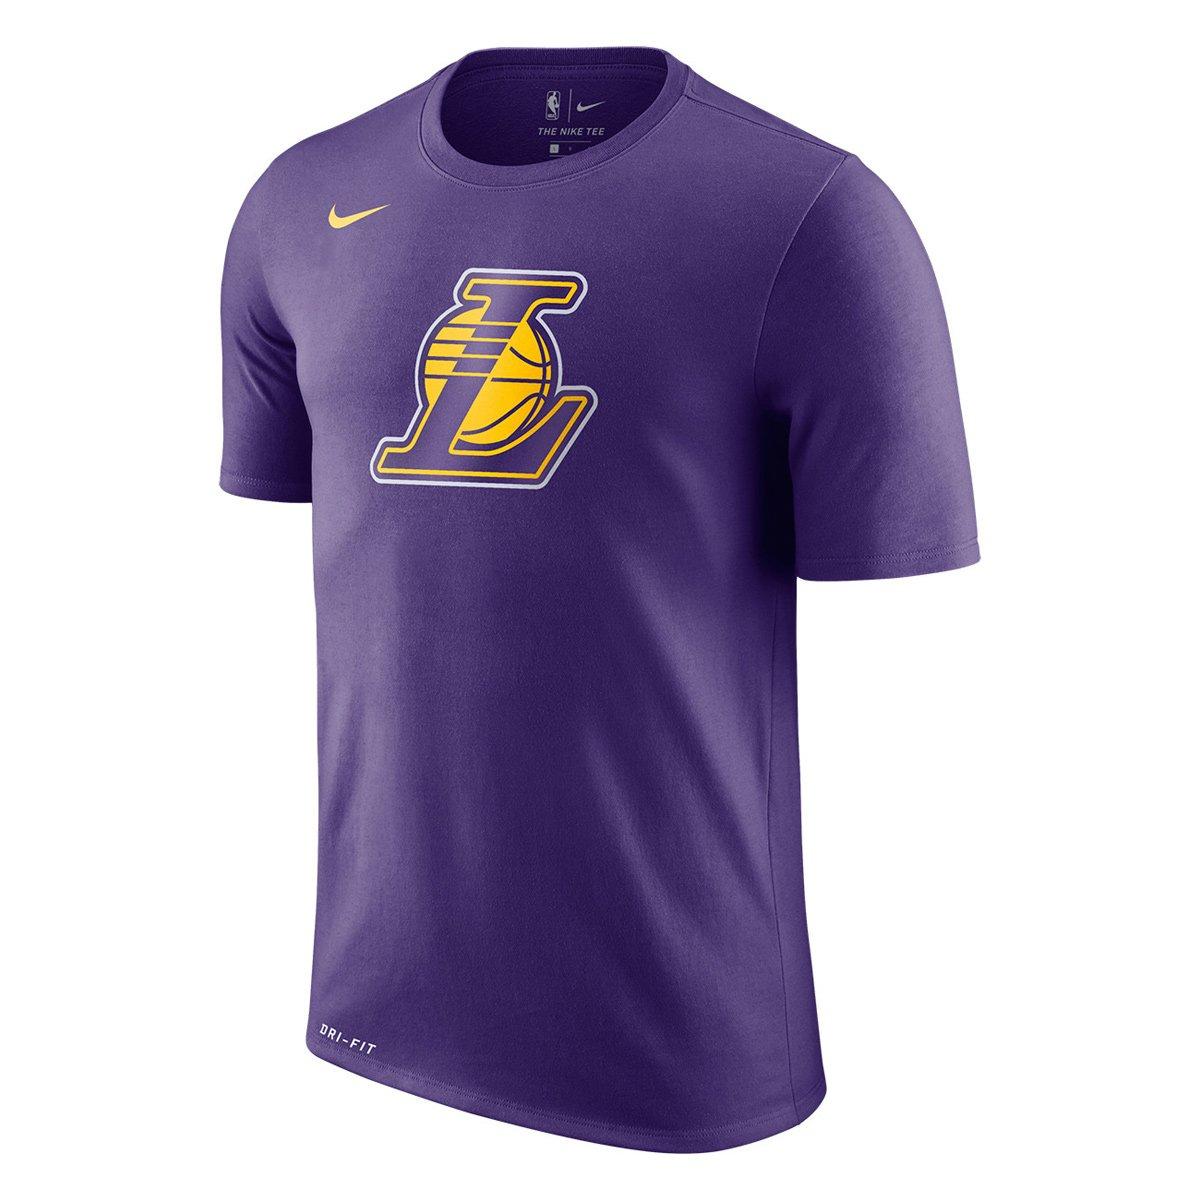 4fef326d3 Camiseta NBA Los Angeles Lakers Nike Logo Masculina - Compre Agora ...